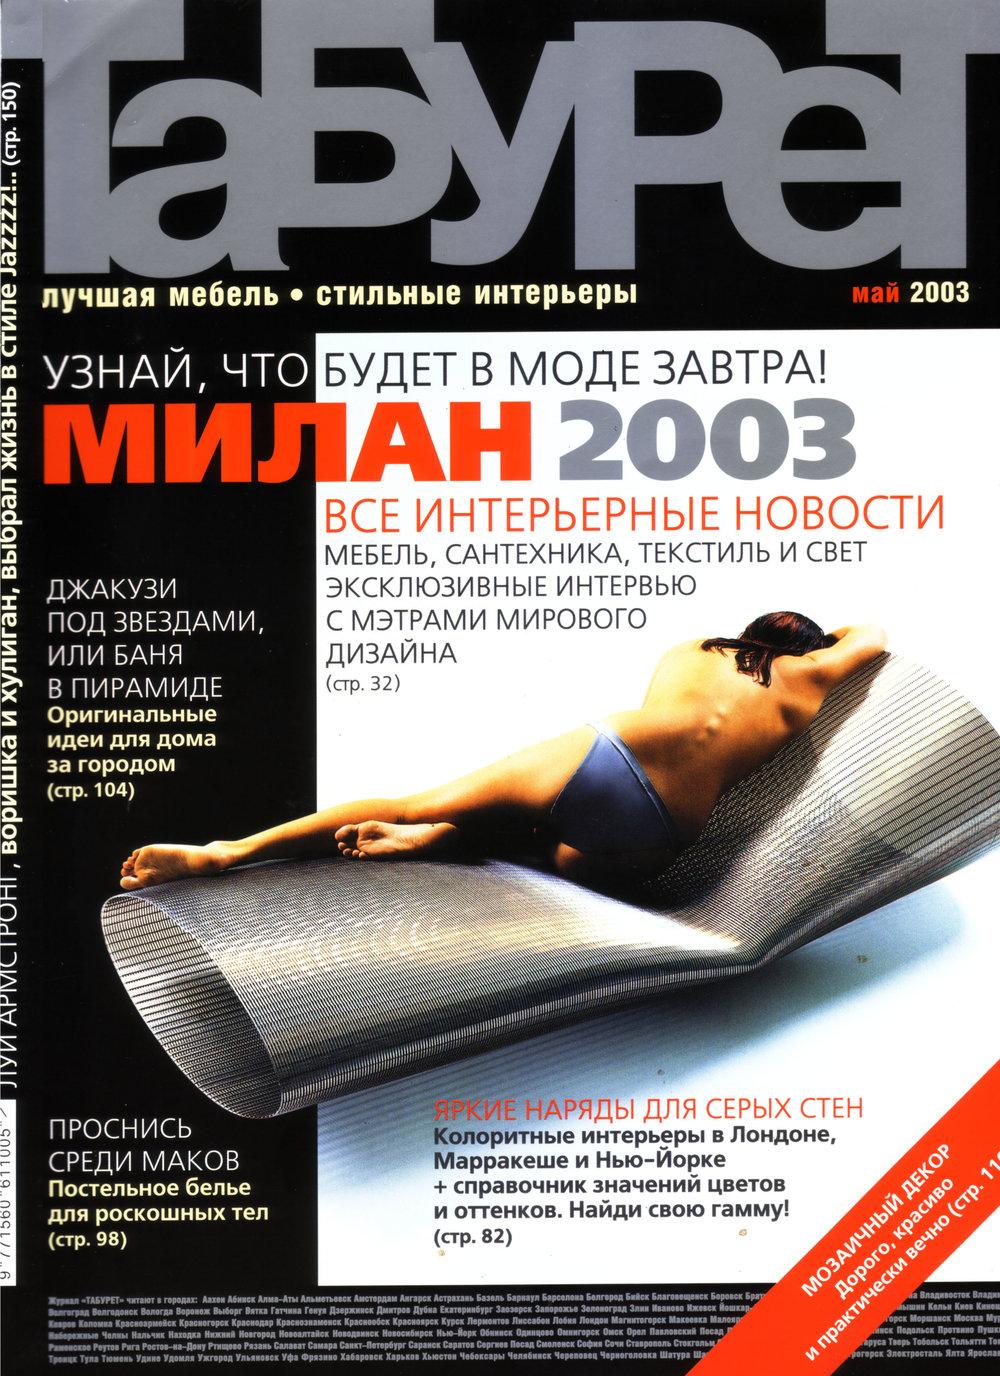 taburet march 2003_cover.jpg